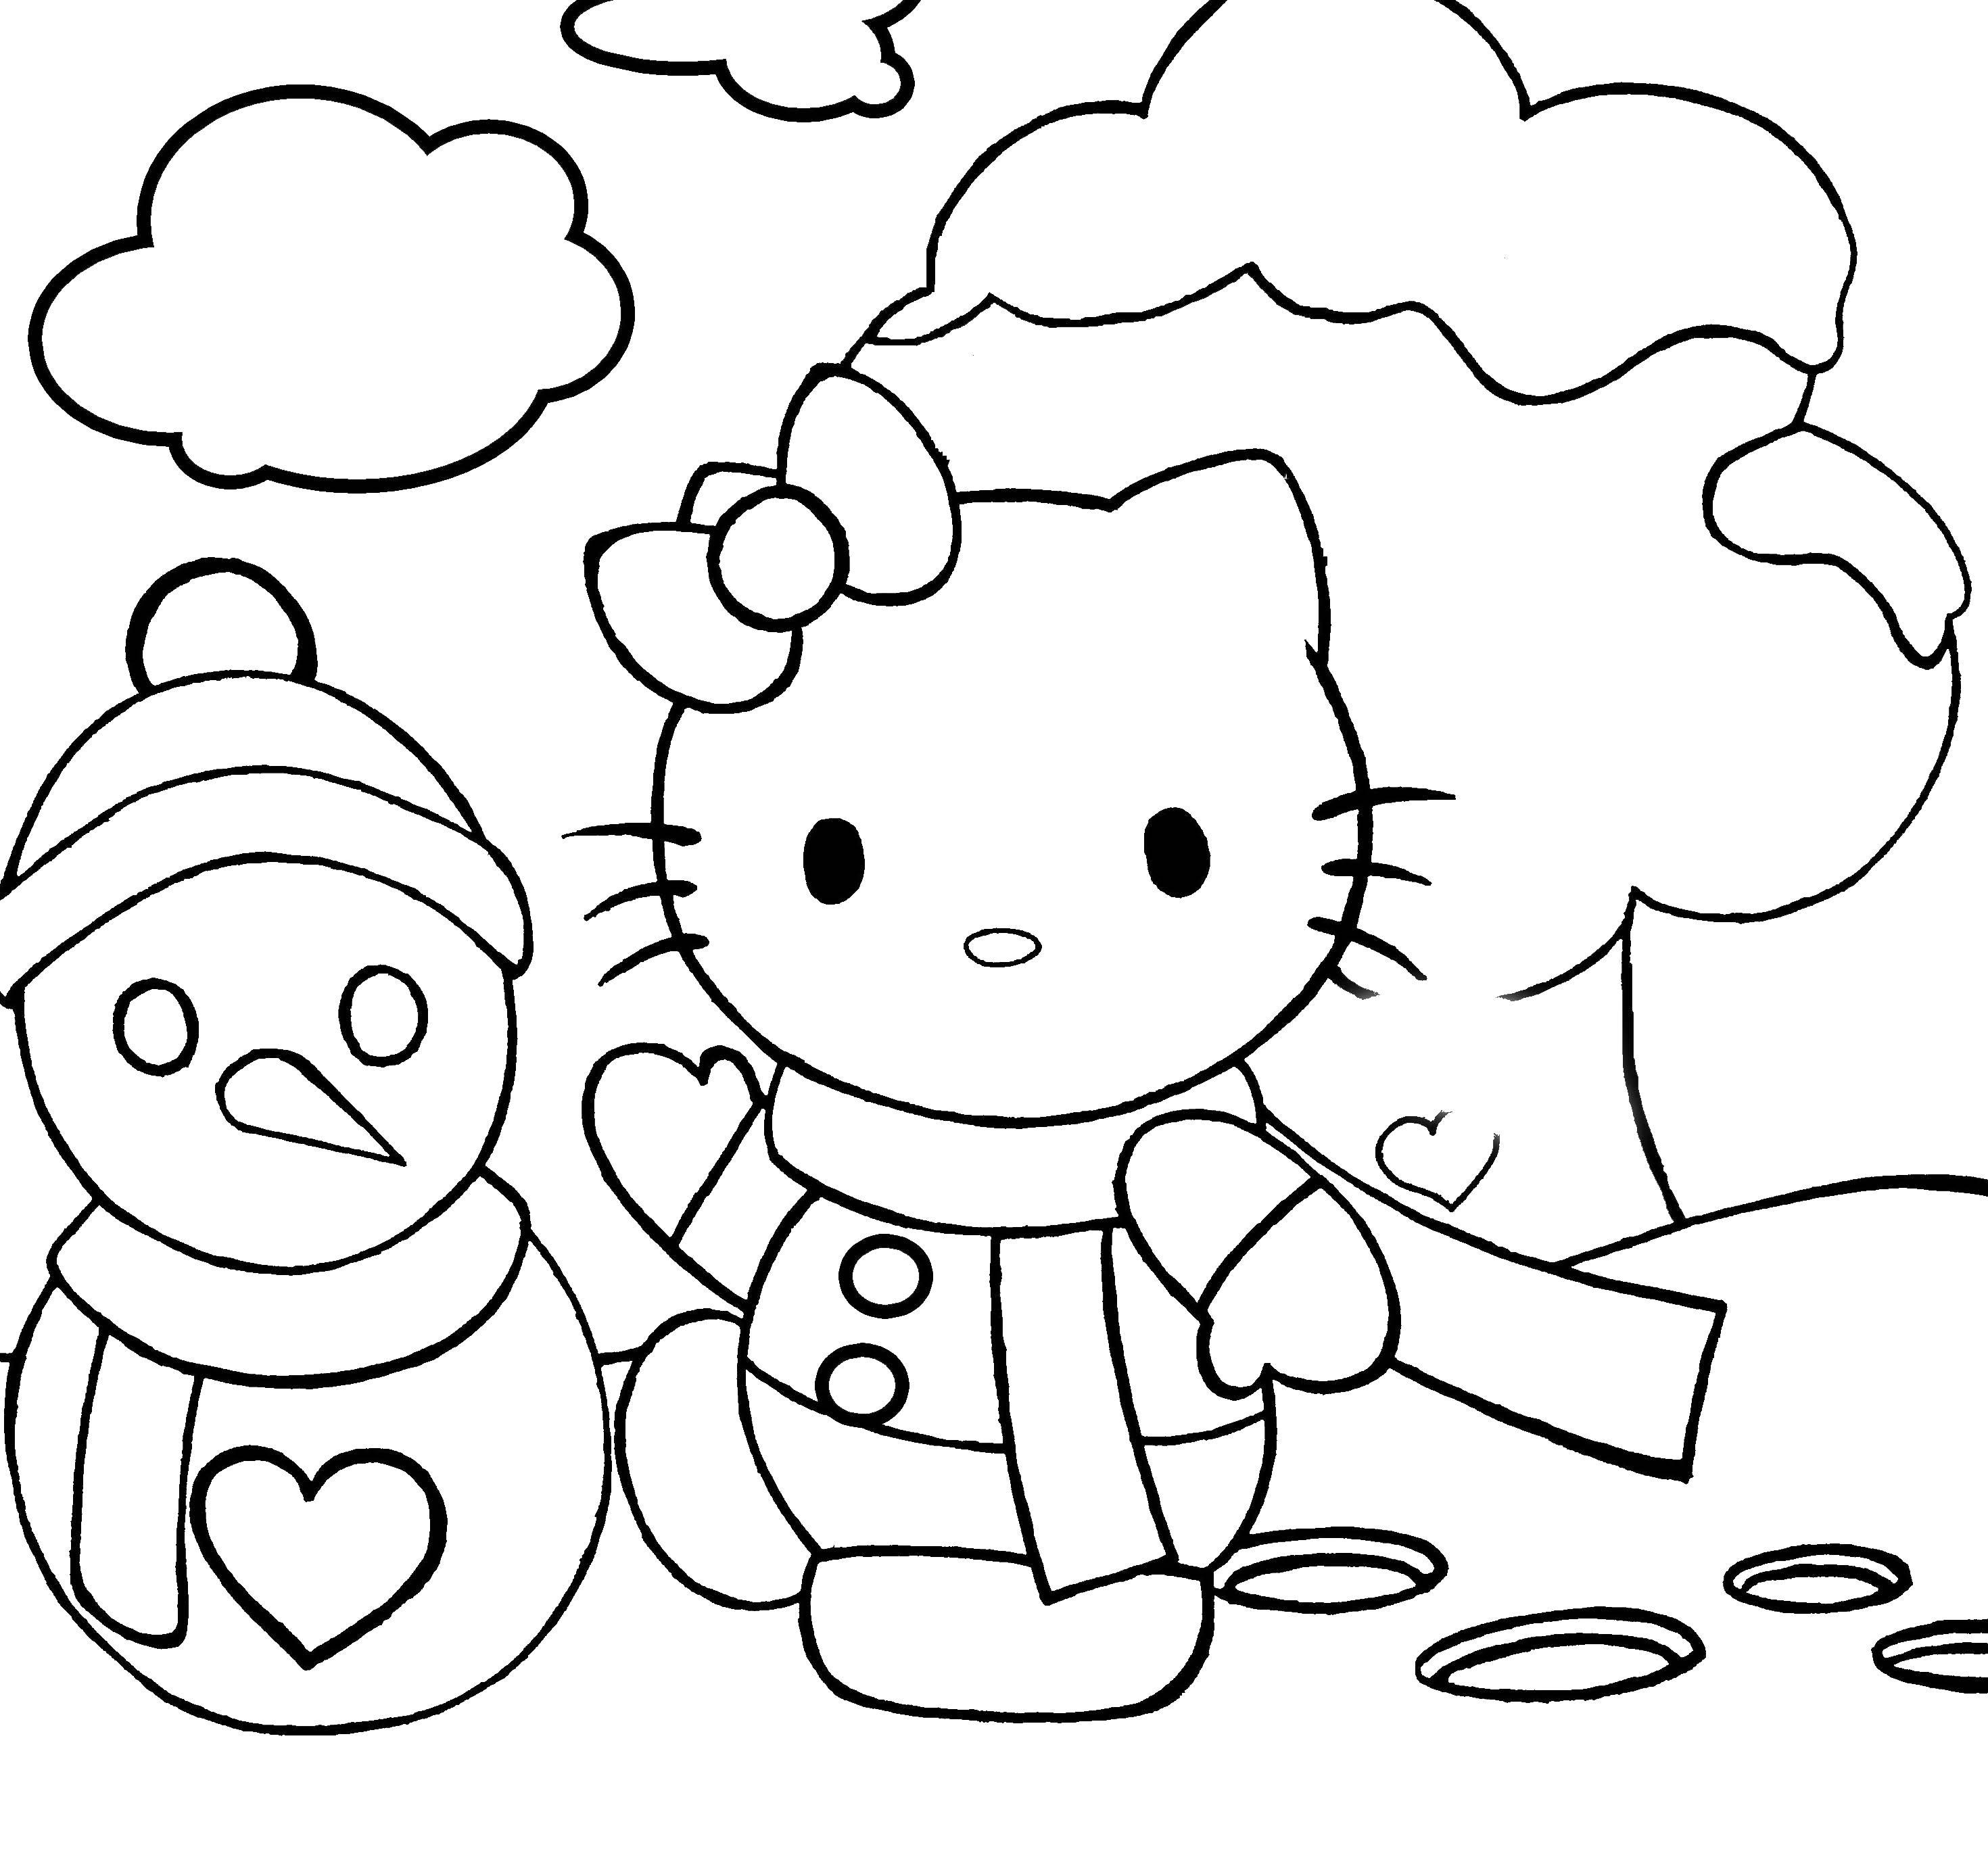 Hello kitty и снеговик Рисунок раскраска на зимнюю тему